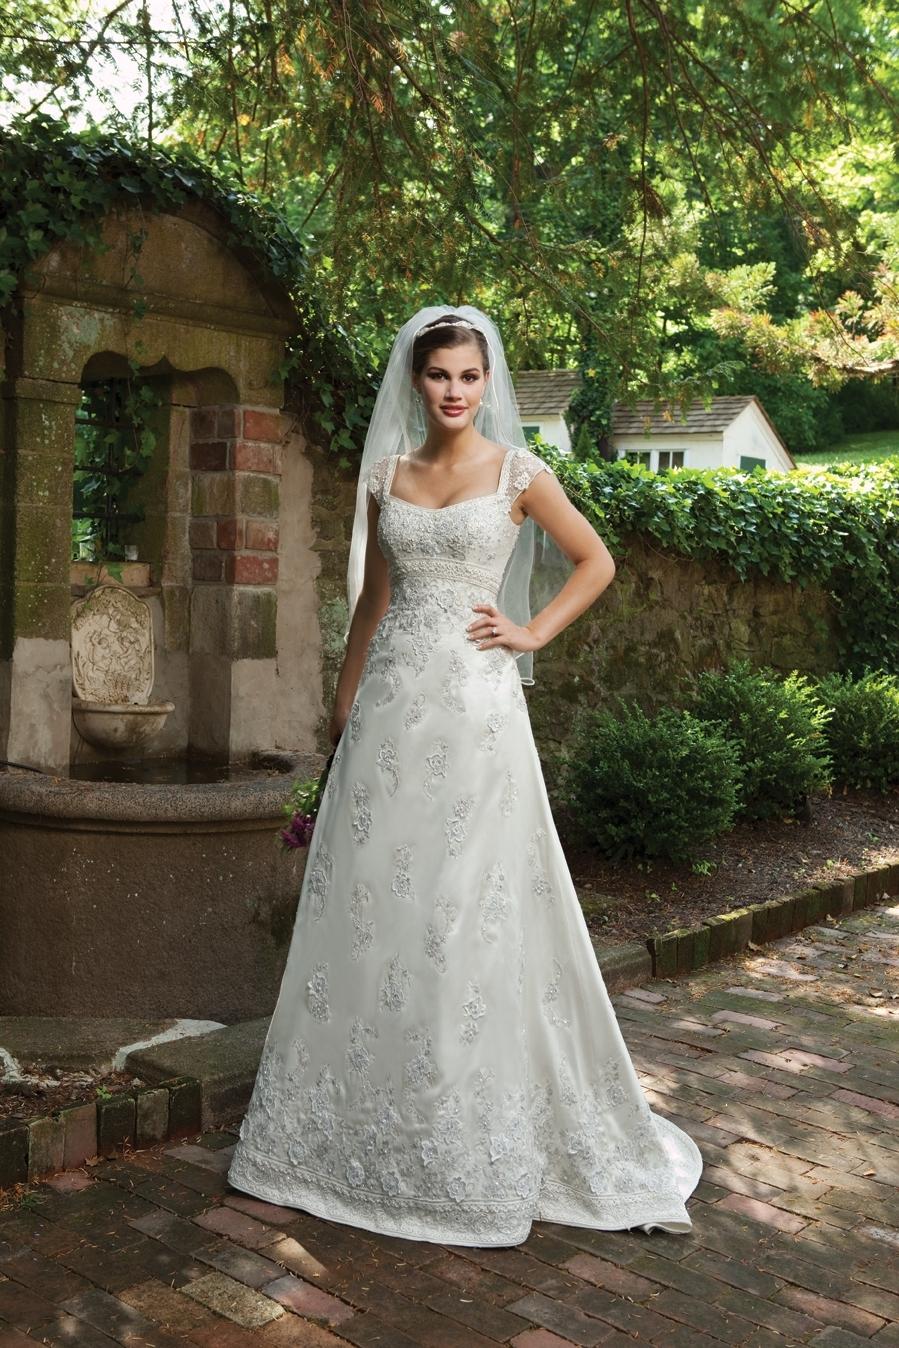 I231101s-spring-2011-wedding-dress-2bebride-kathy-ireland.full